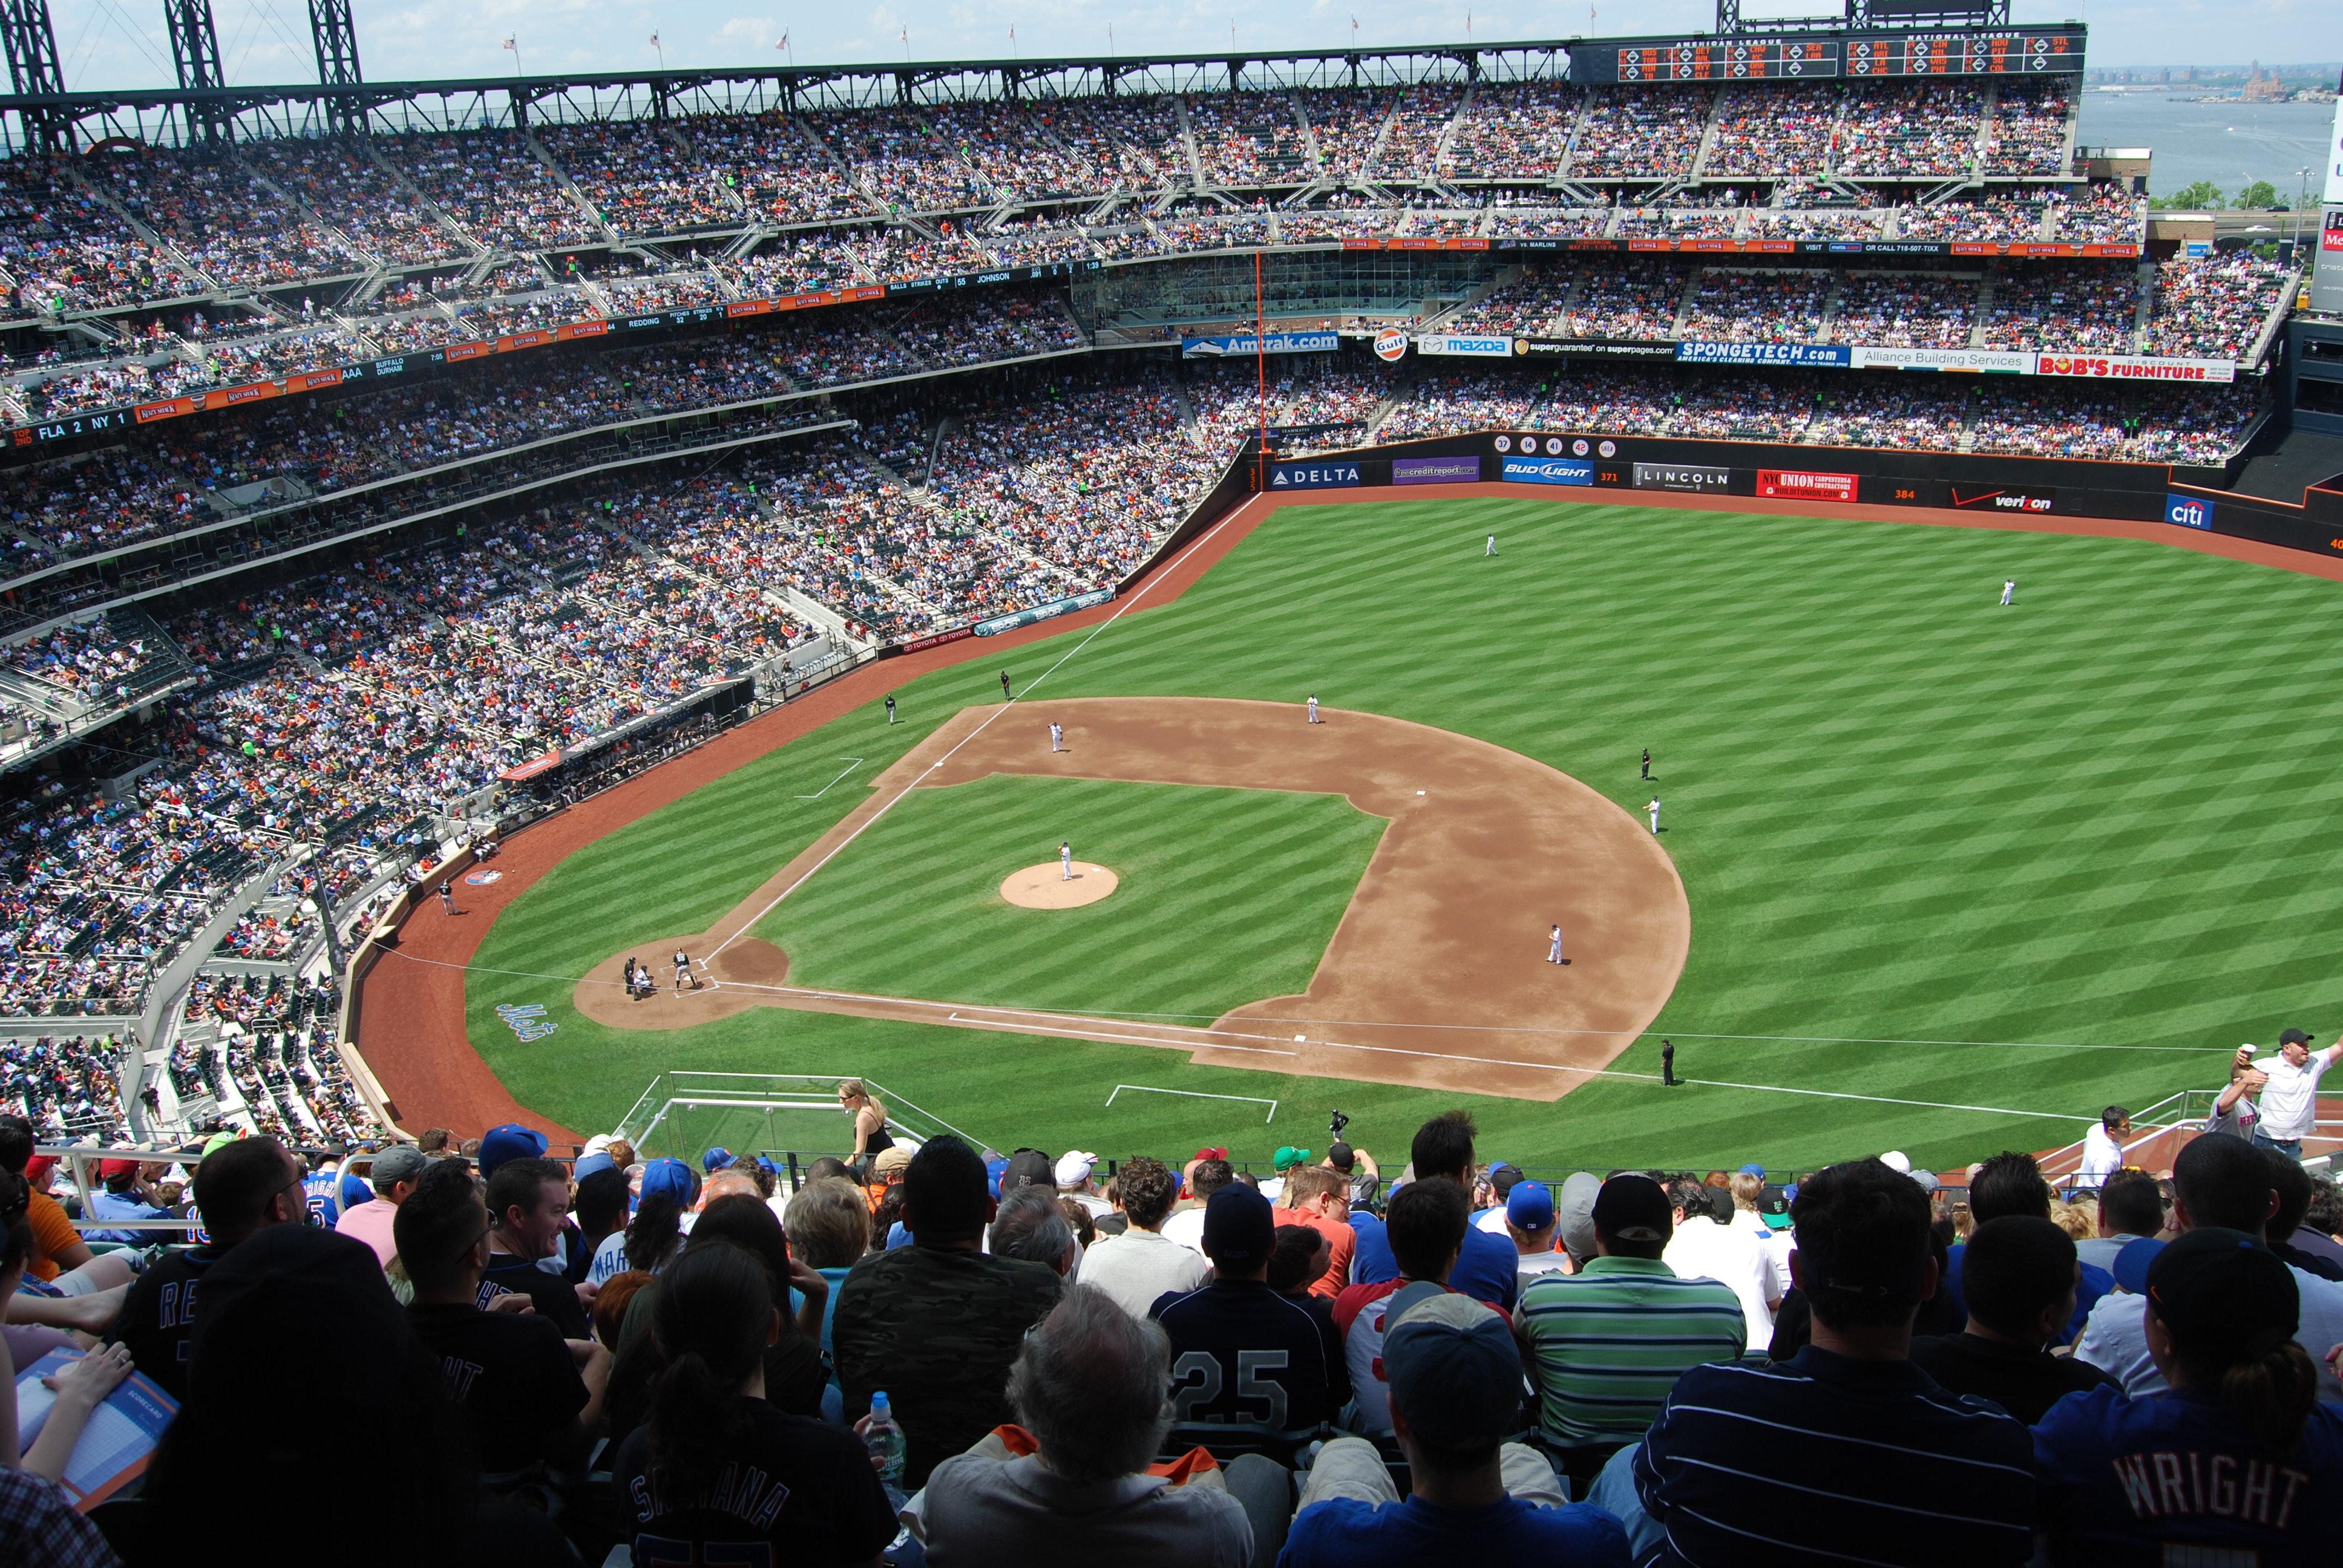 The Mets current stadium, Citi Field